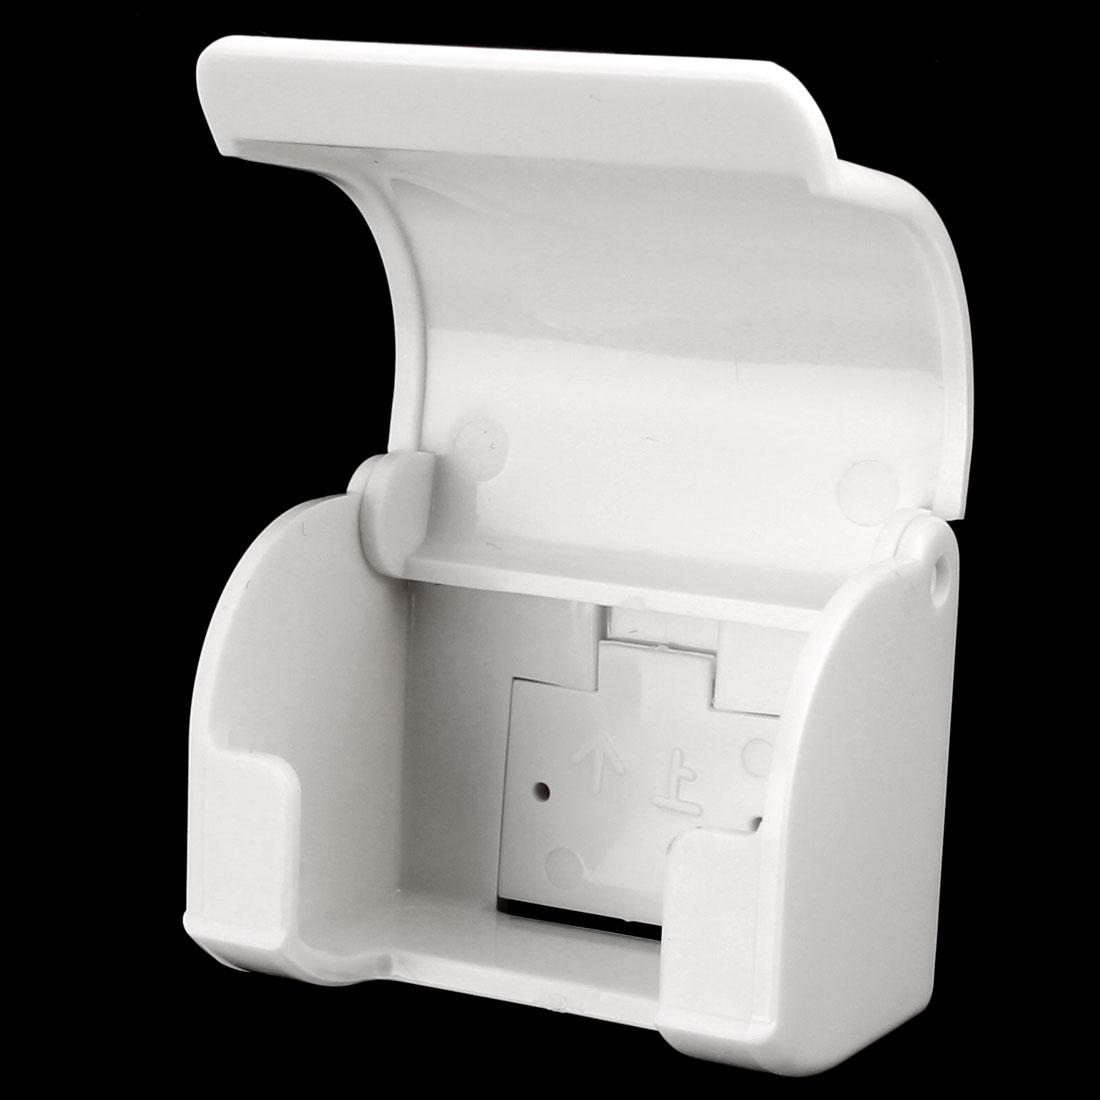 Man Bathroom Plastic Paste Strap Hanger Storage Rack Shaver Razor Holder White - image 3 de 5